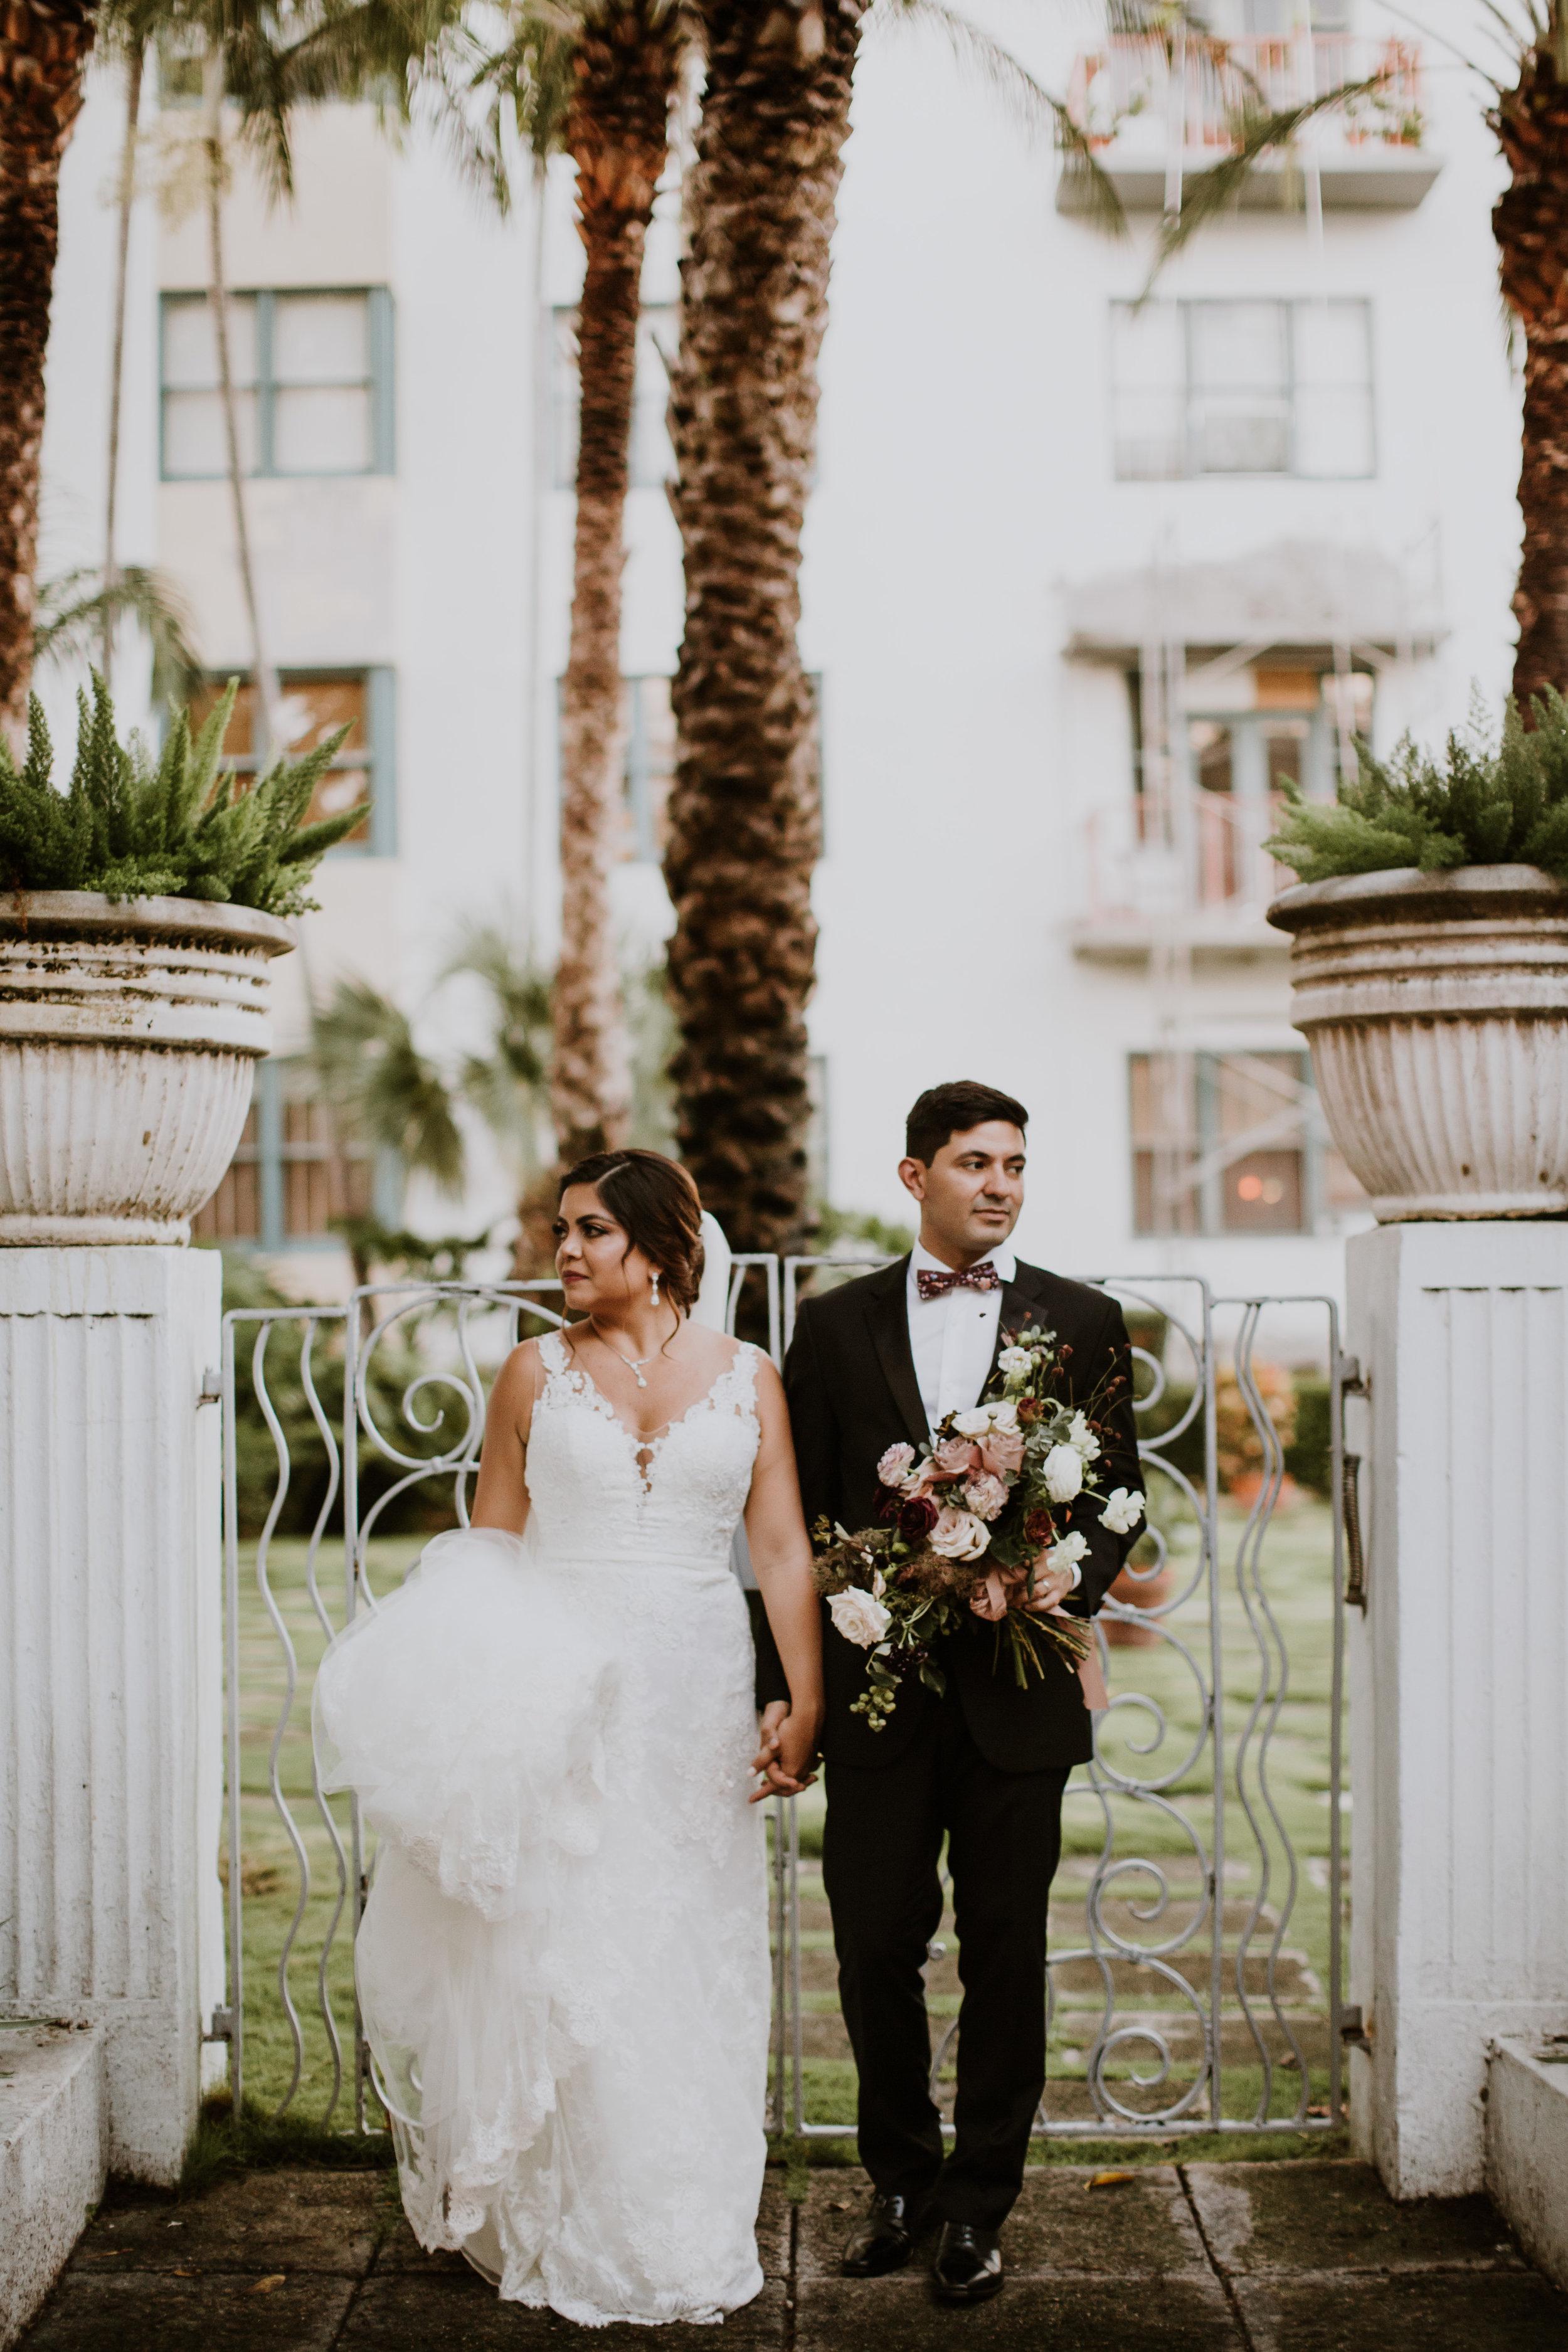 VinandKaren_Married-269.jpg